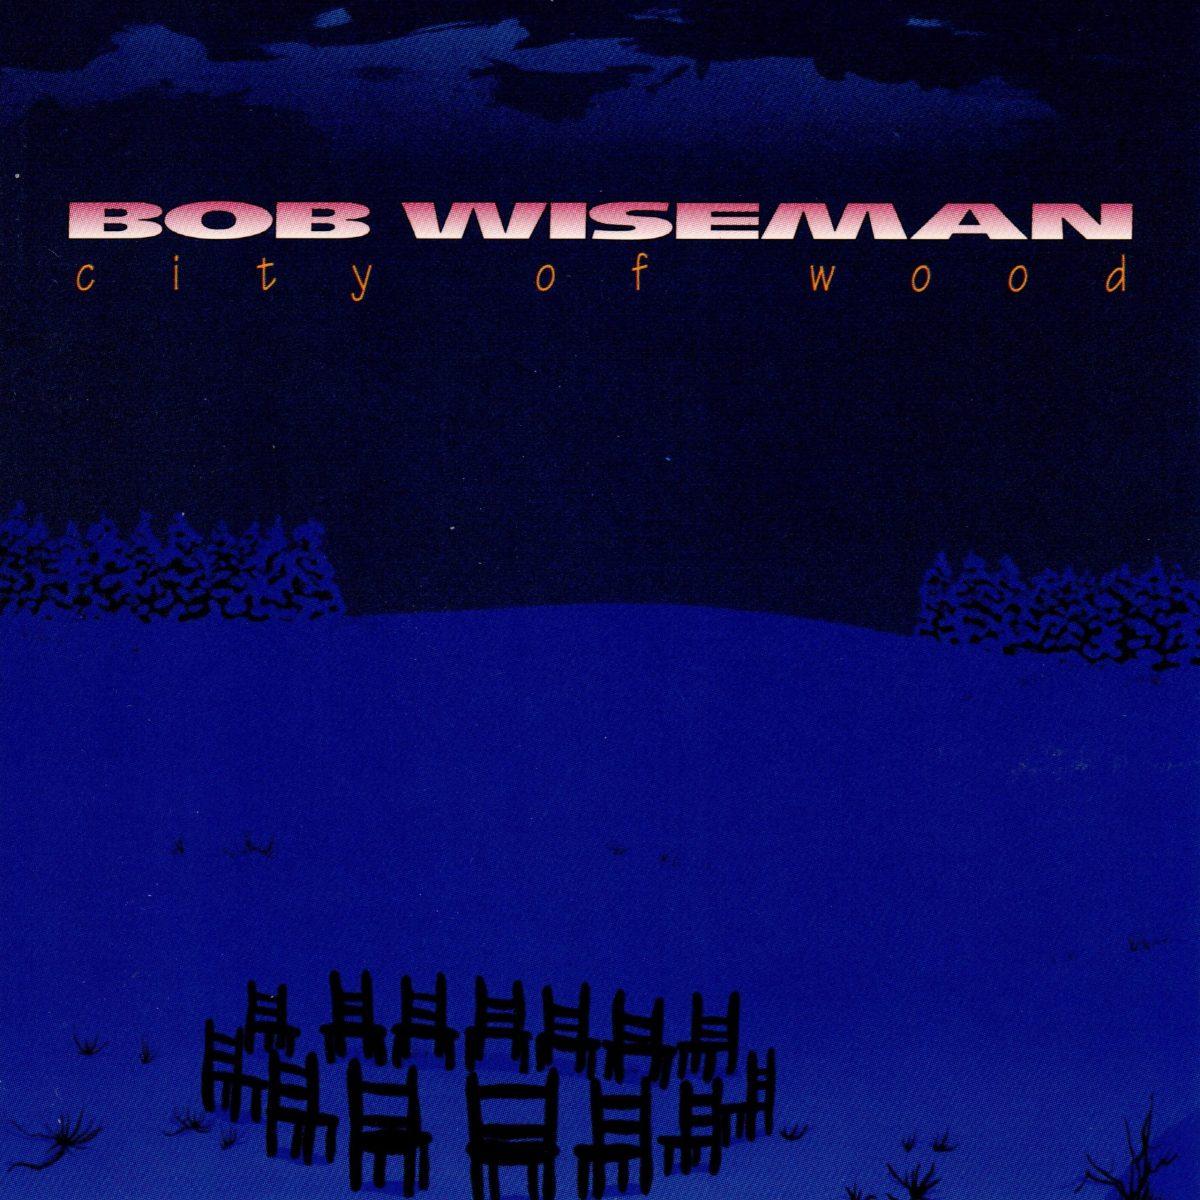 Bob Wiseman, City of Wood album cover